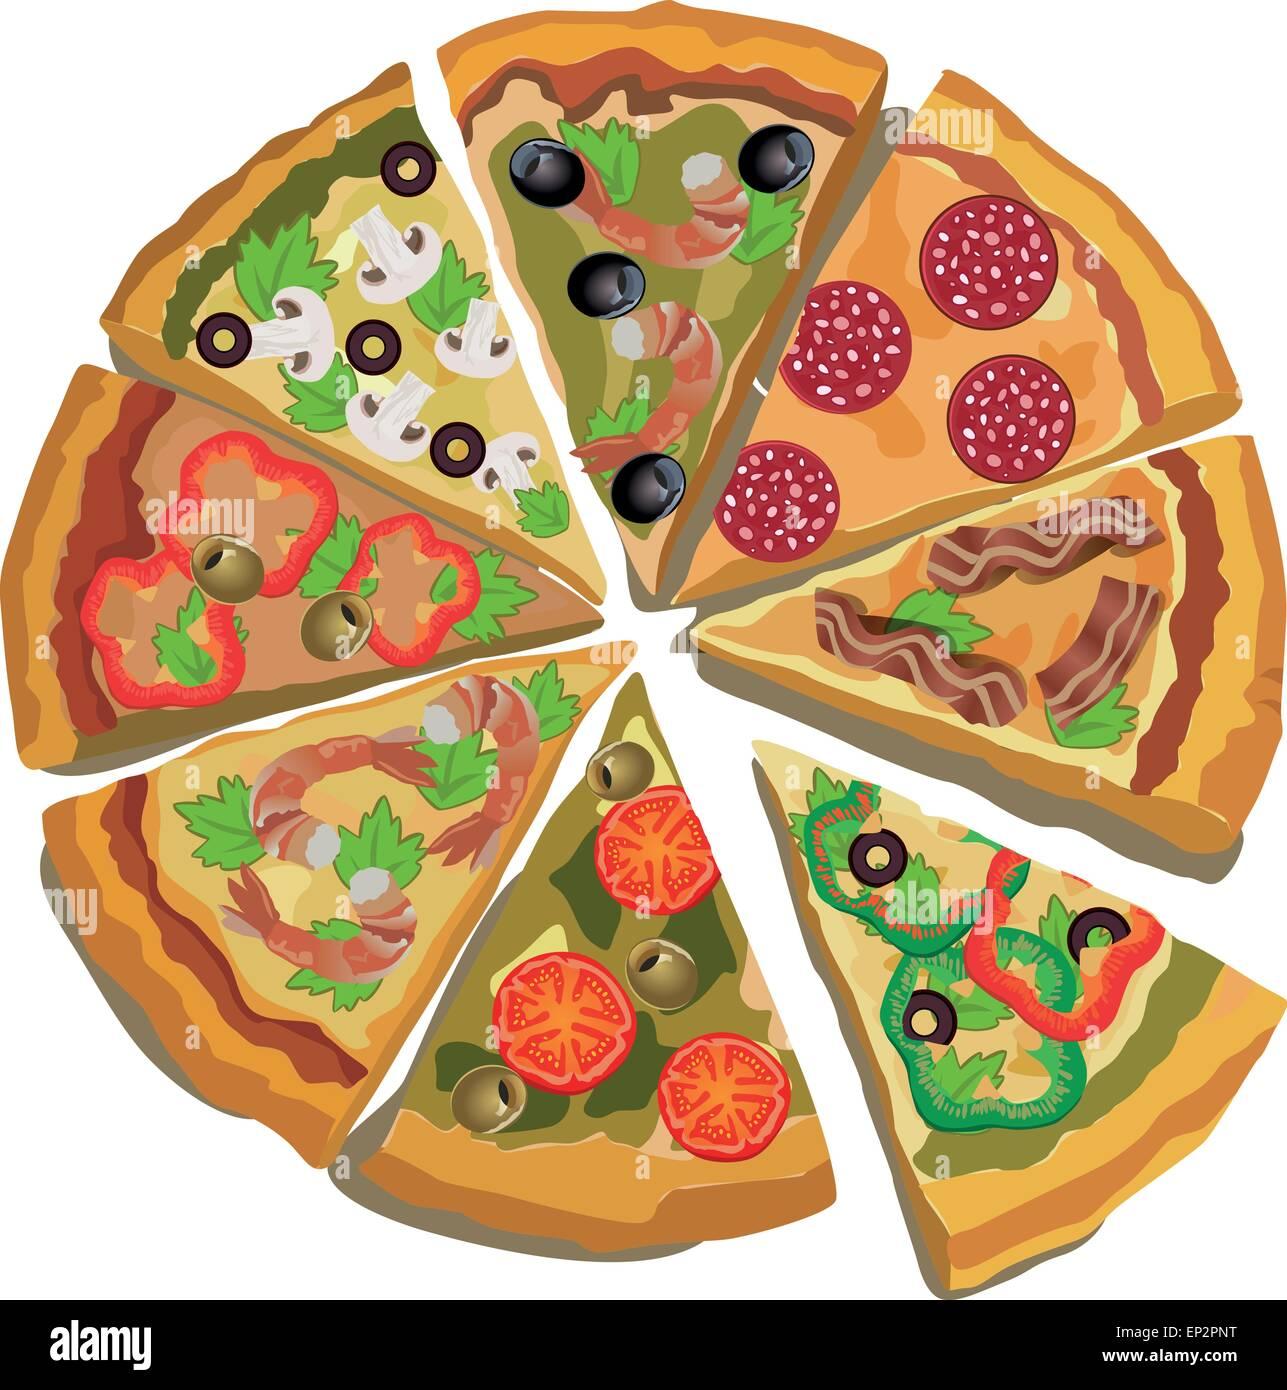 Pizza Kitchen Design In Italy